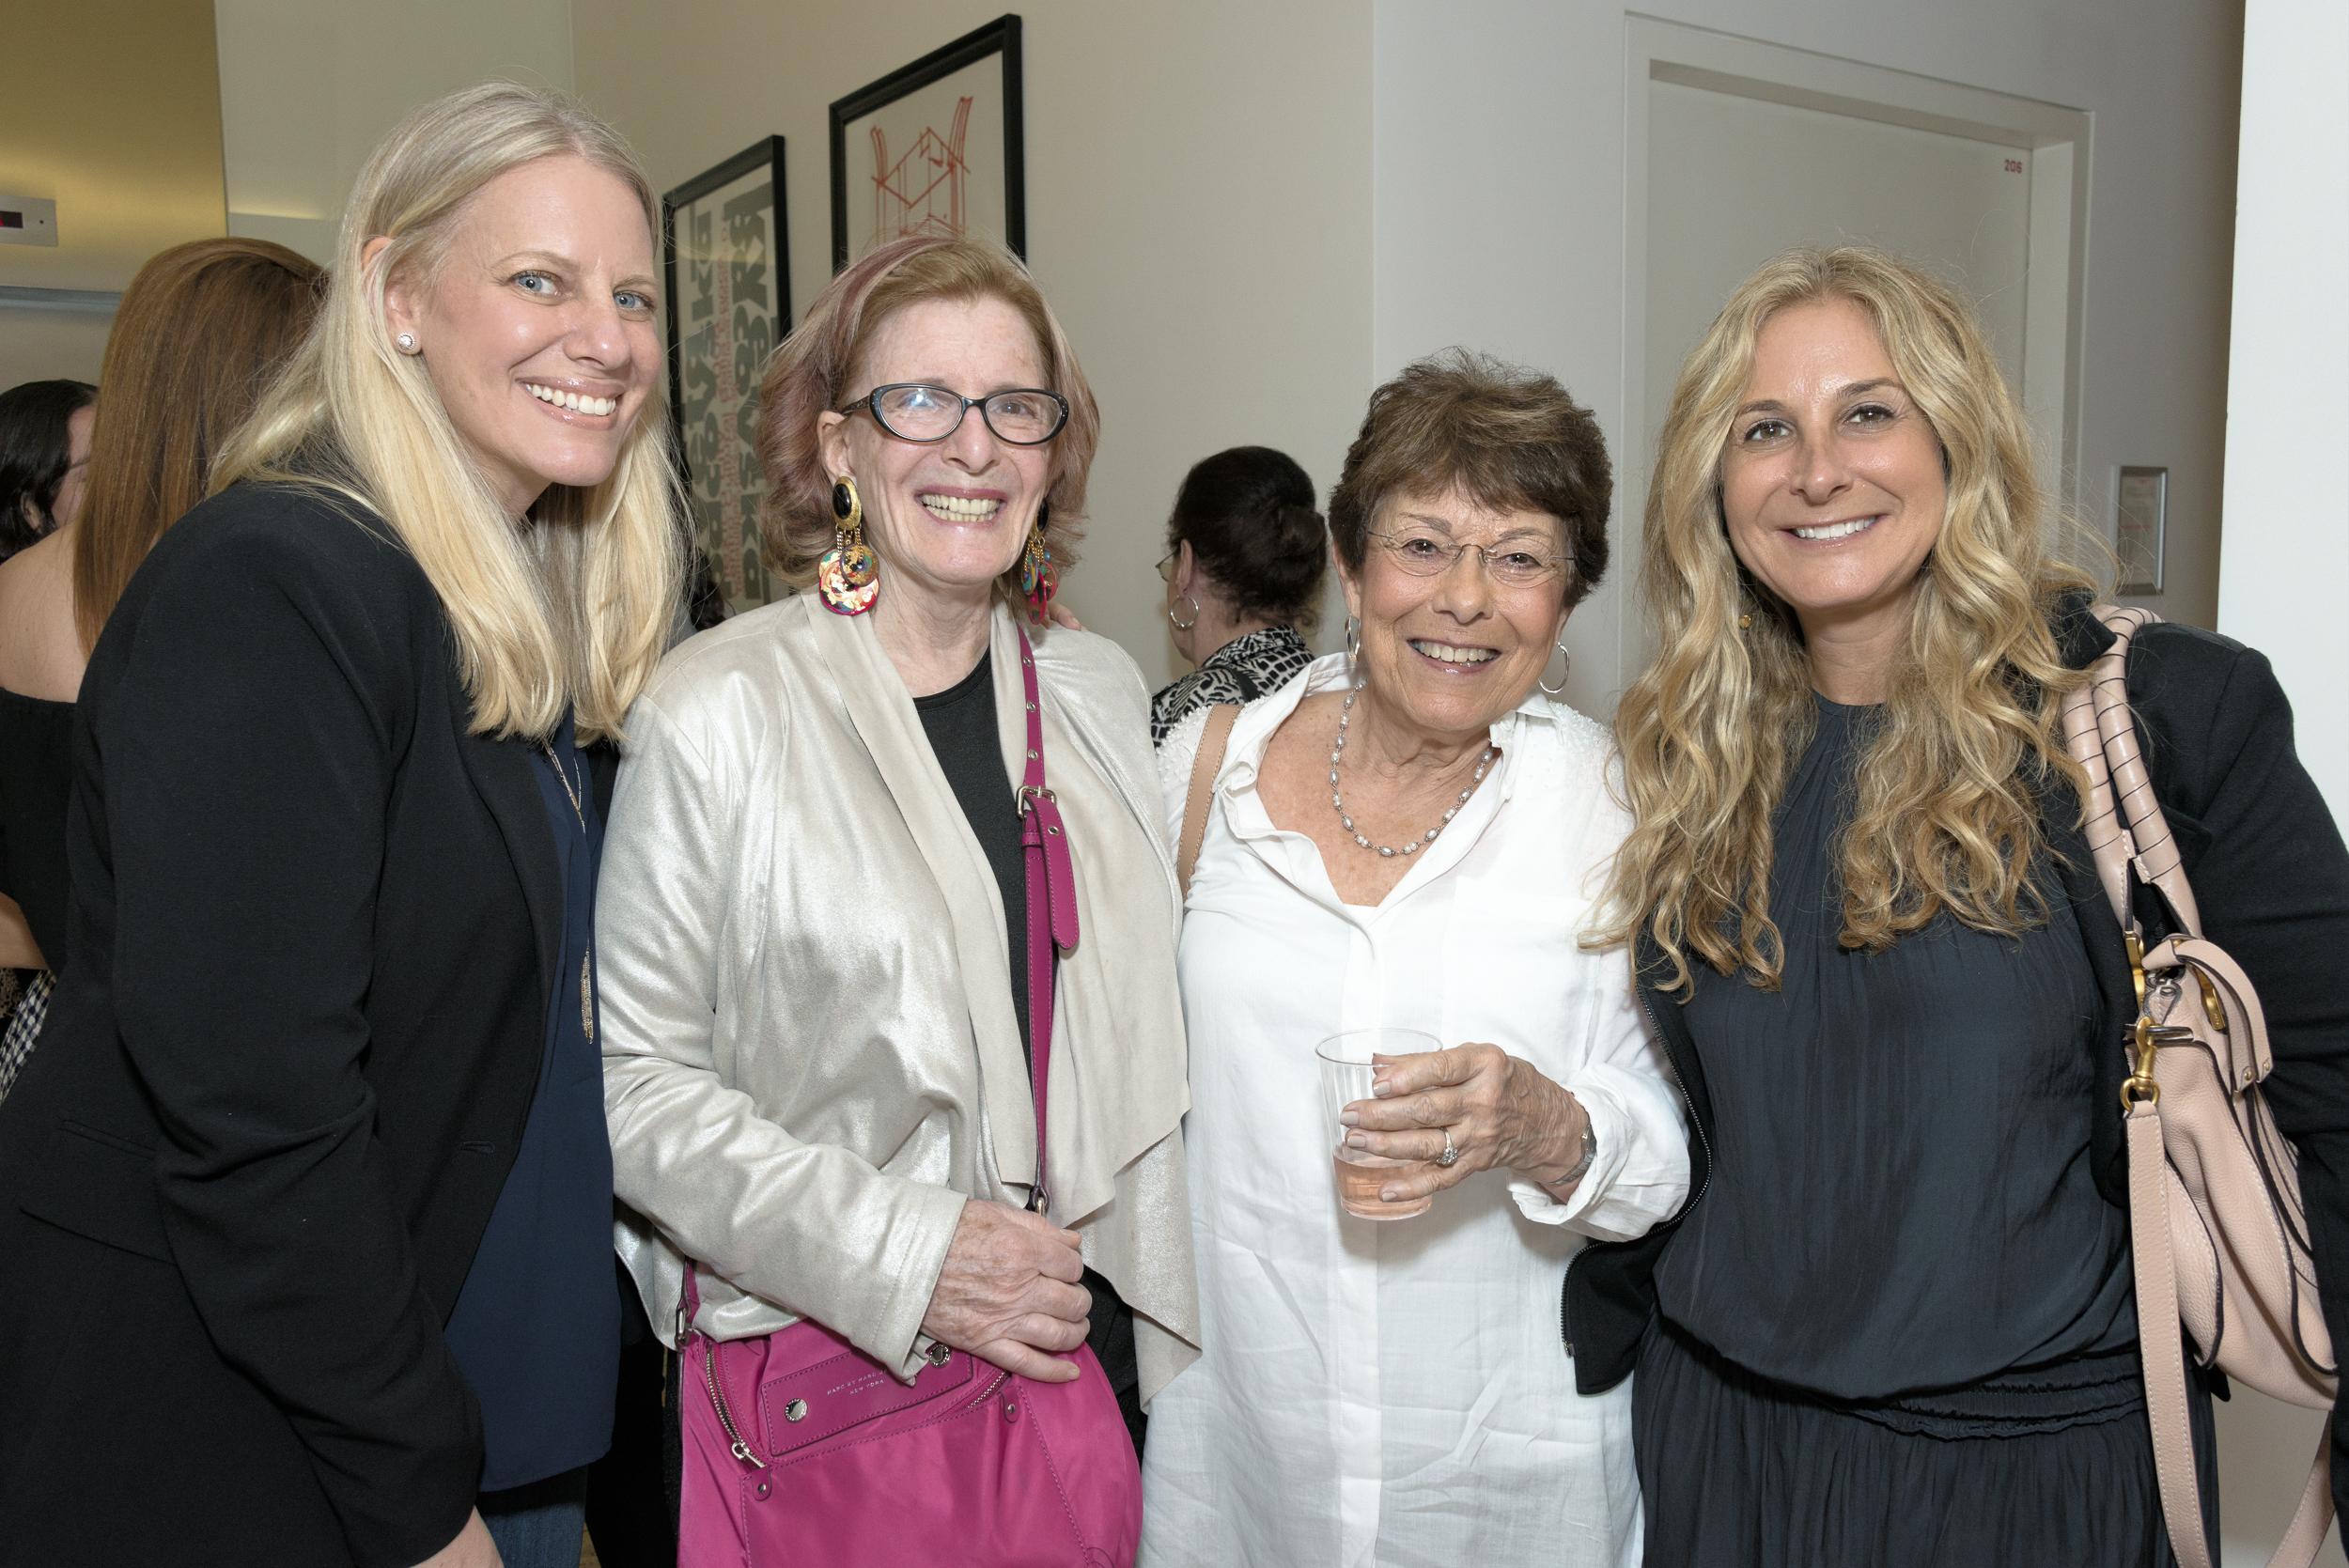 (L-R) Sharon Weiss, Barbara Meltzer, Susan Kastin and Pamela Weinberg